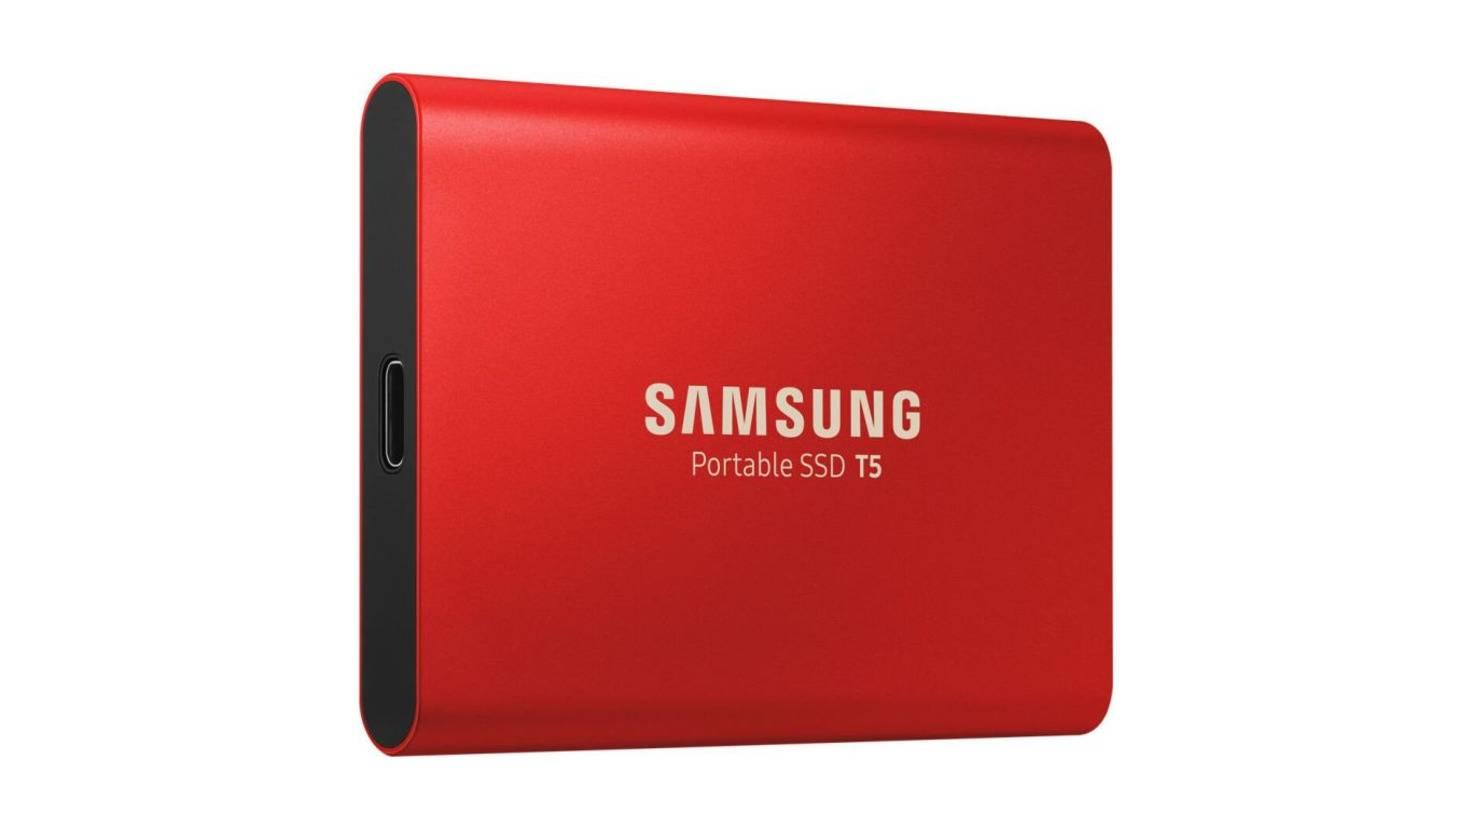 samsung-portable-ssd-t5-500-gb